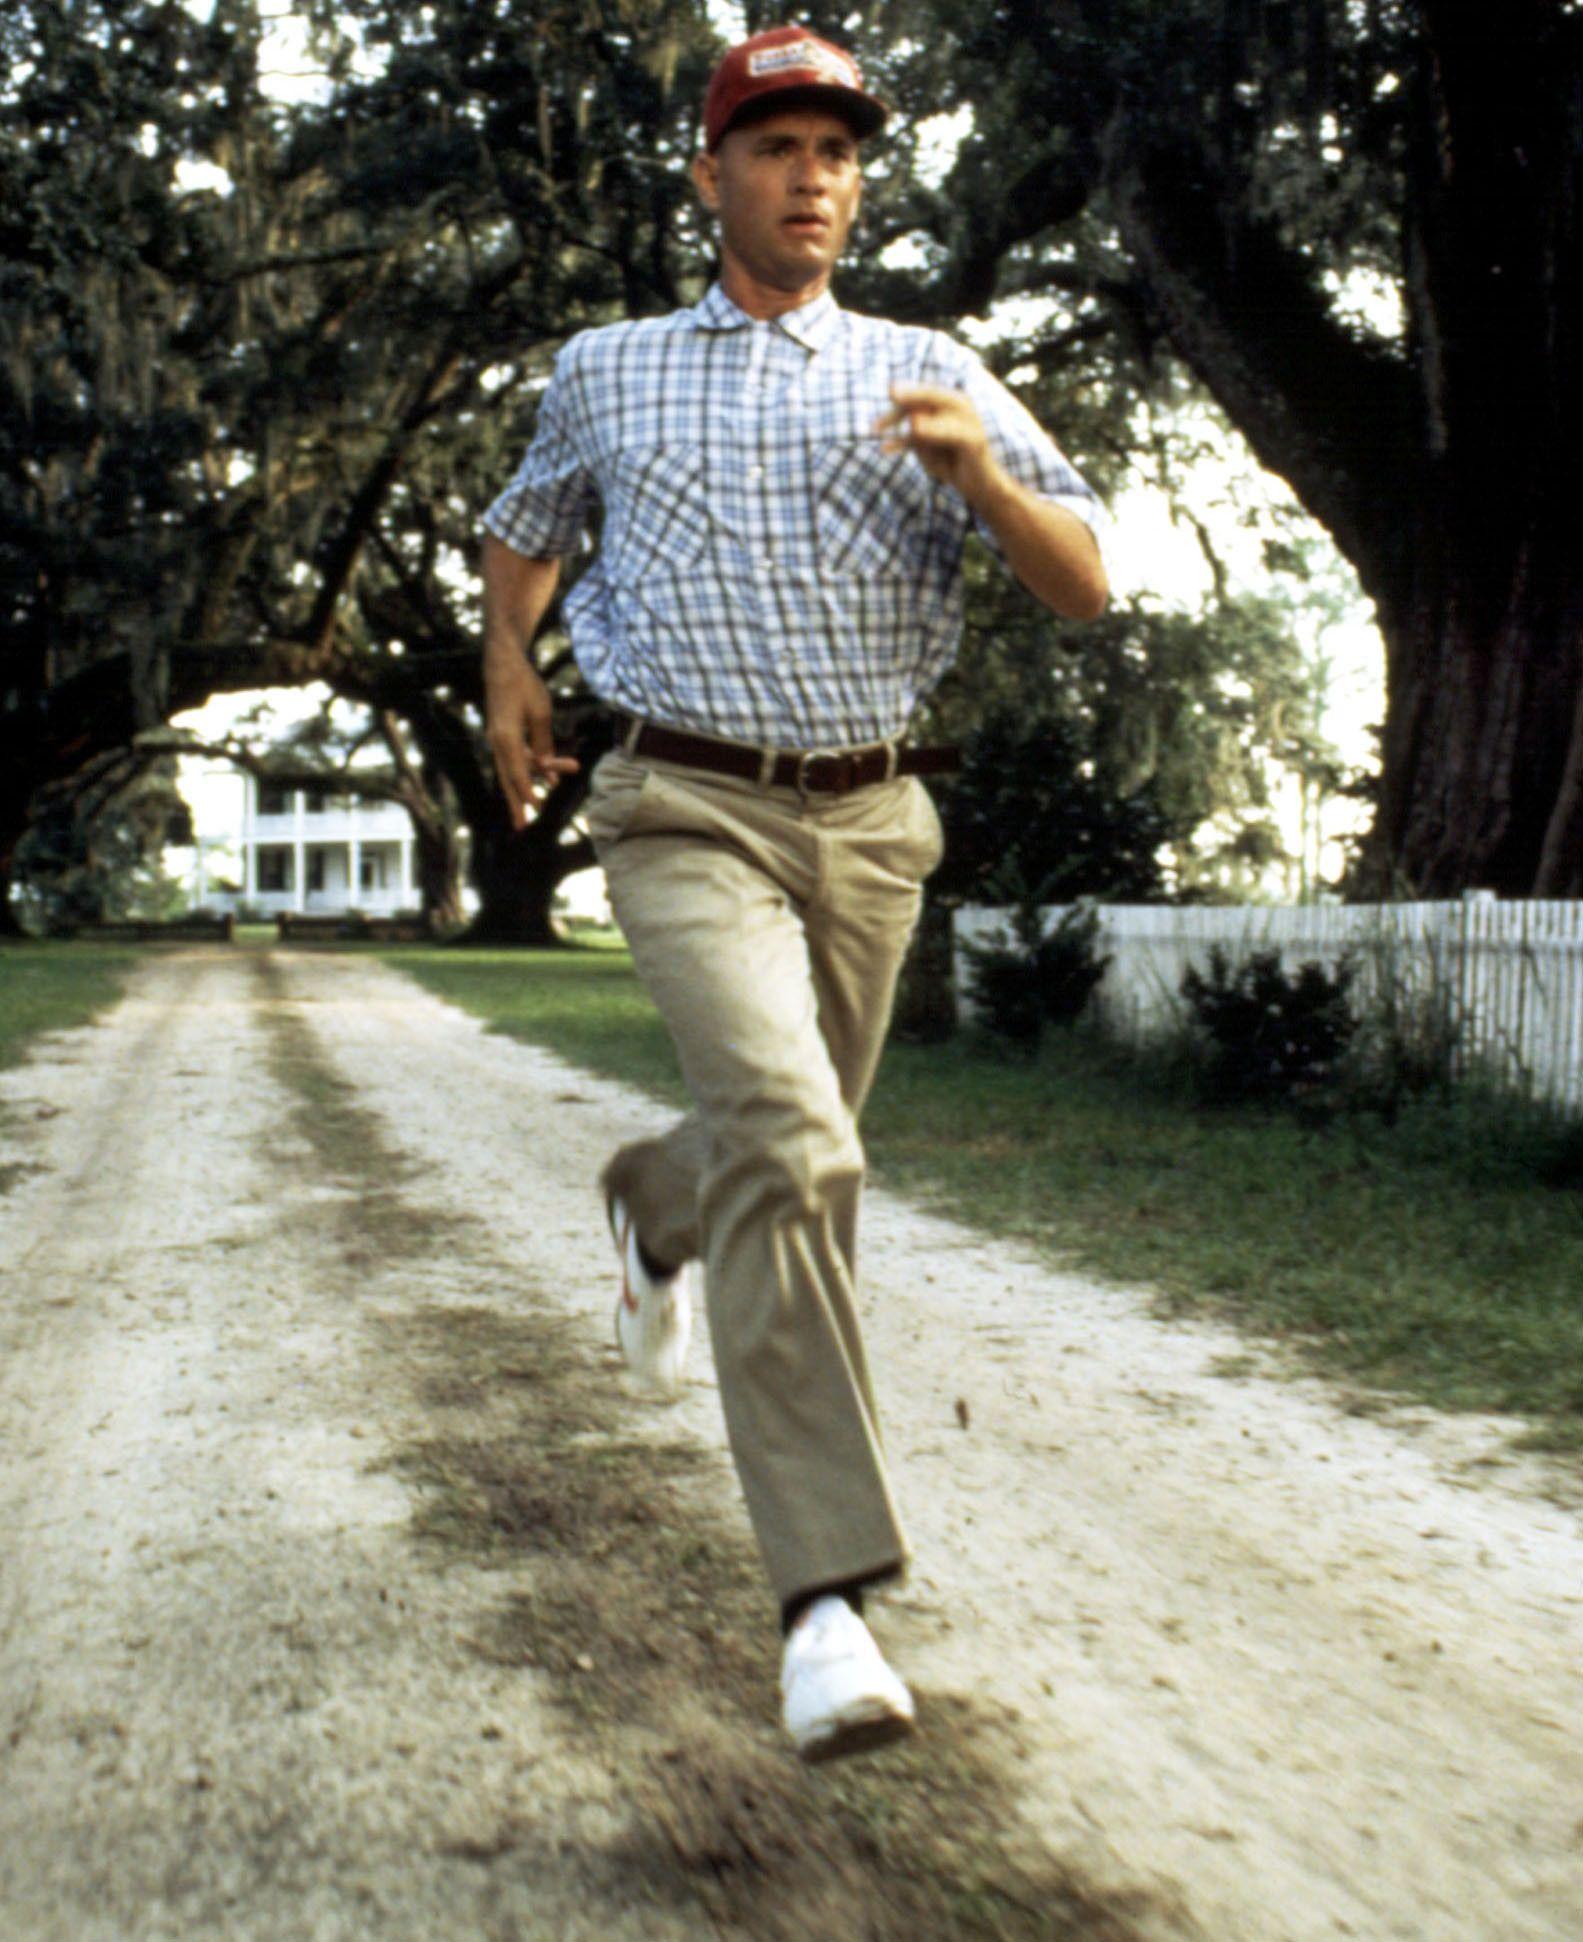 Le gusta correr